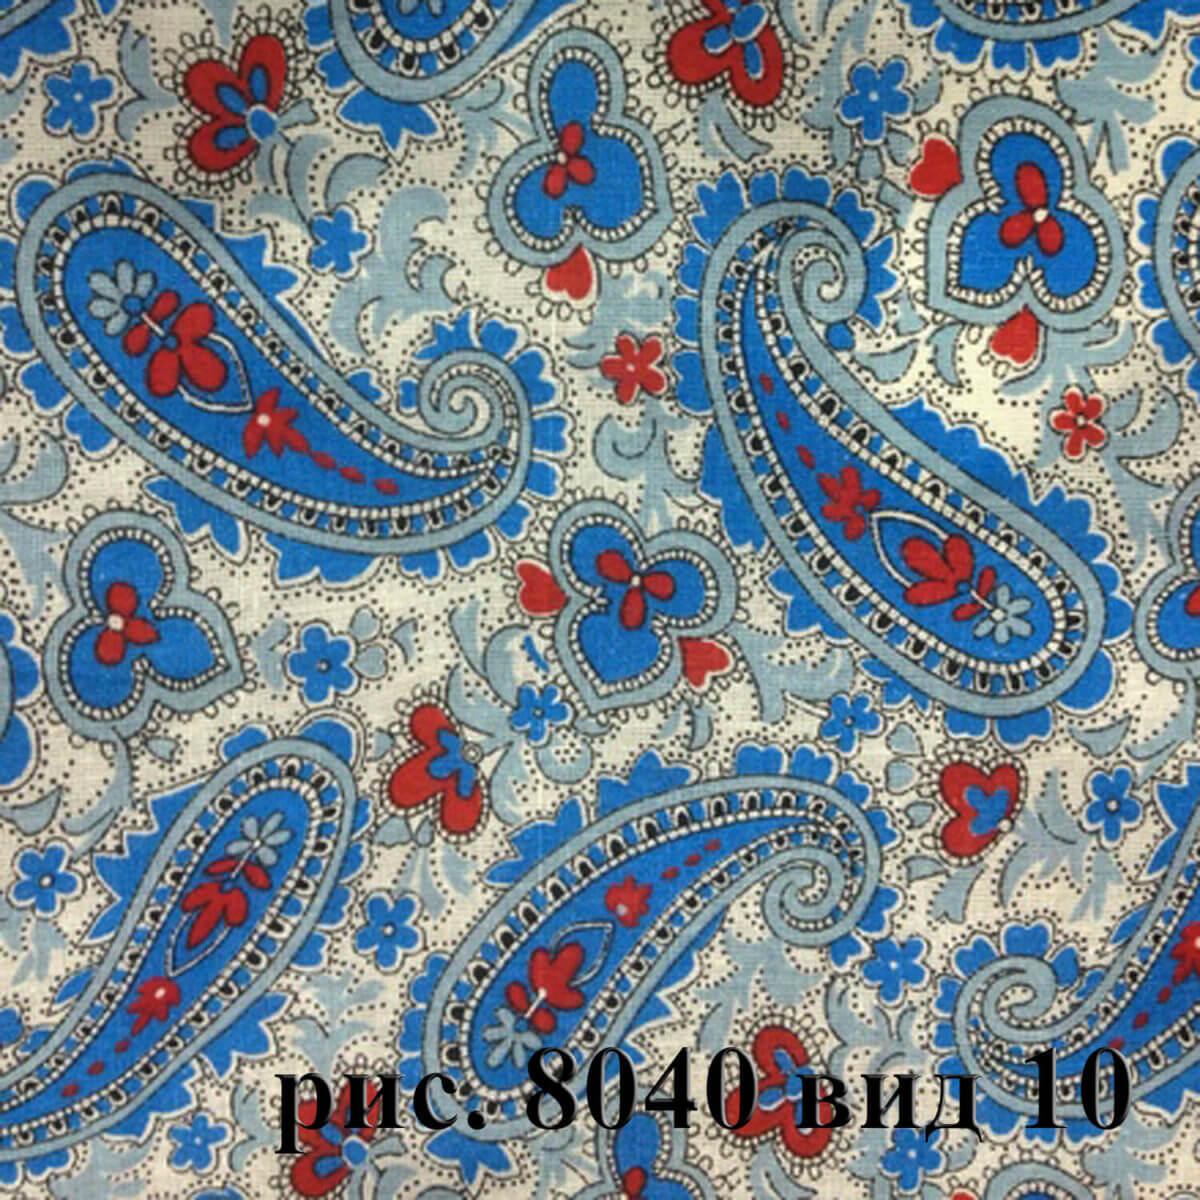 Фото 26 - Плательная ткань бязь 150 см (8040/10) Под заказ.